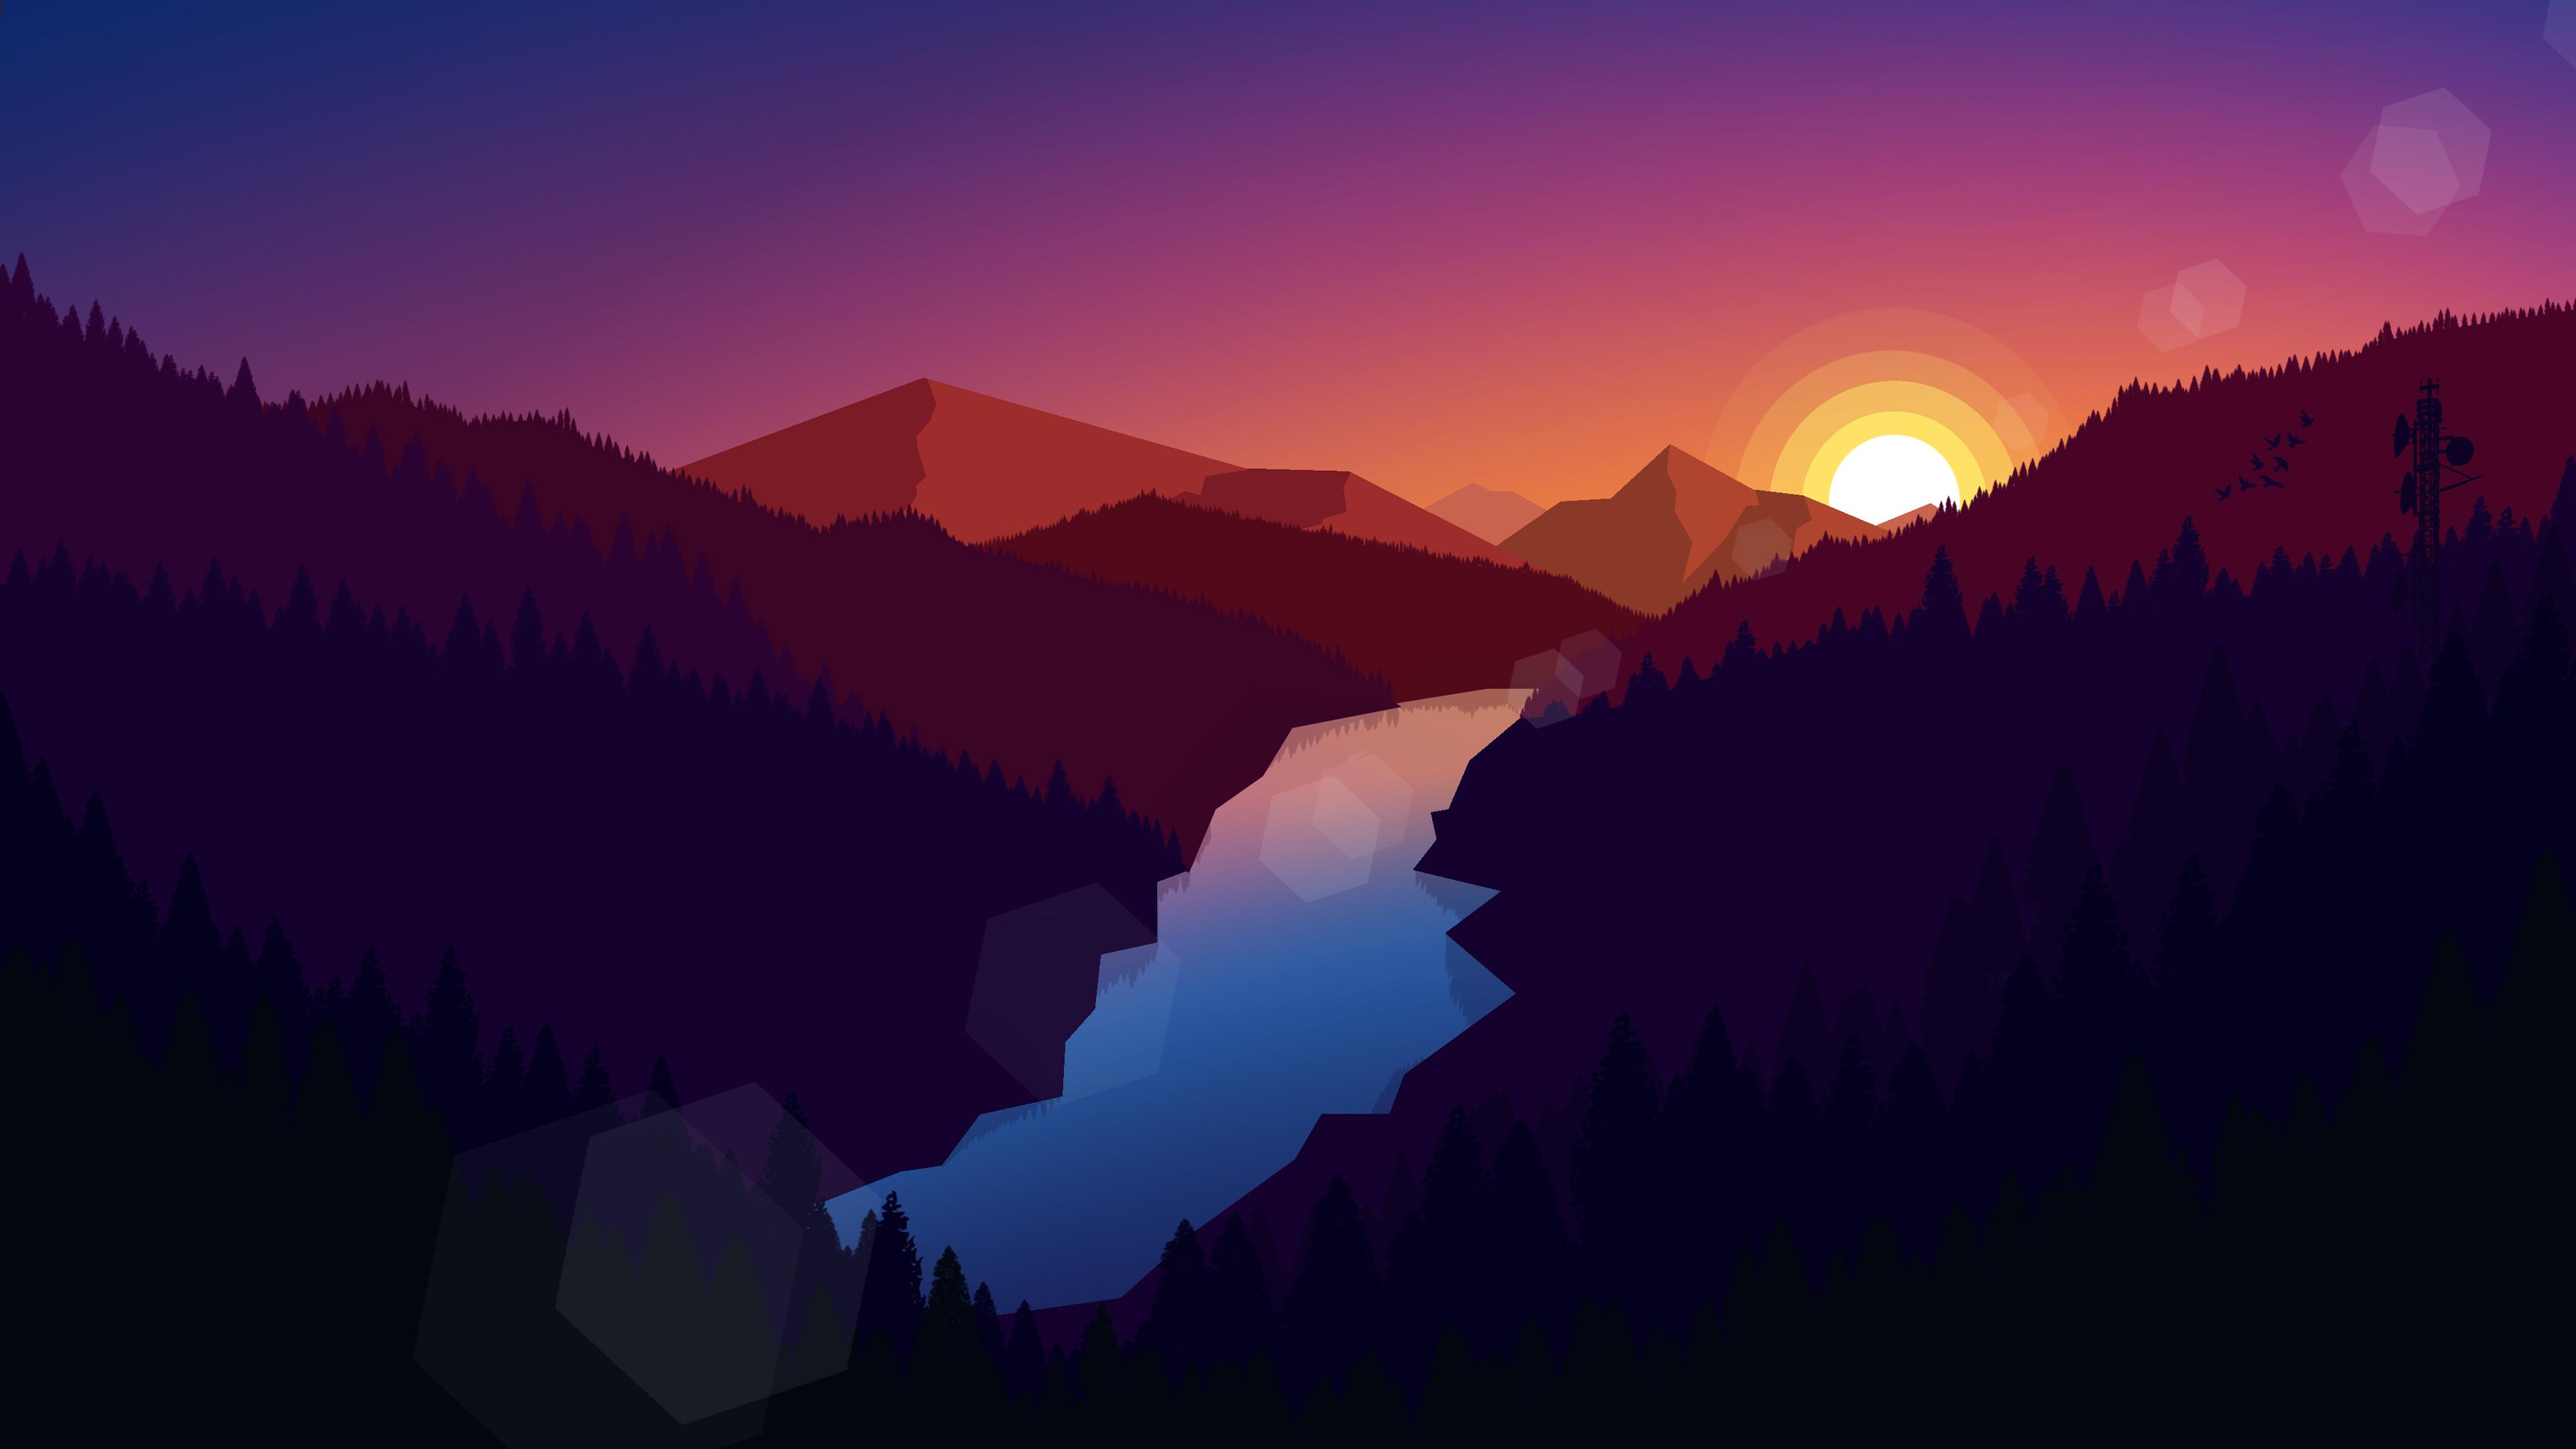 Forest Dark Evening Sunset Last Light Minimalistic, HD ...